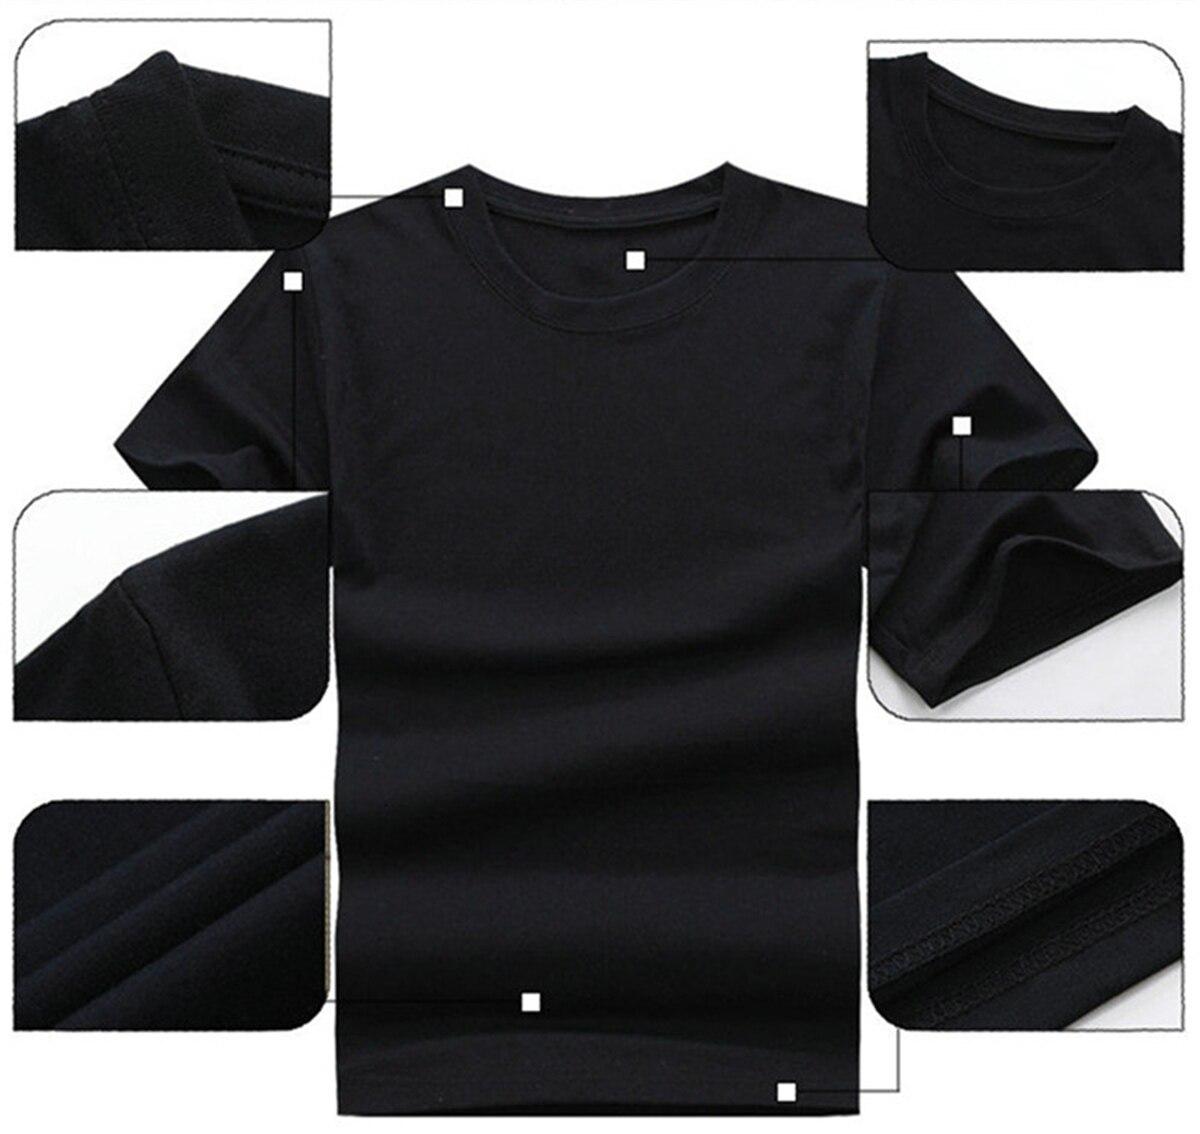 GILDAN London England UK Vintage British Union Jack T-Shirt Hot Womens T-shirt